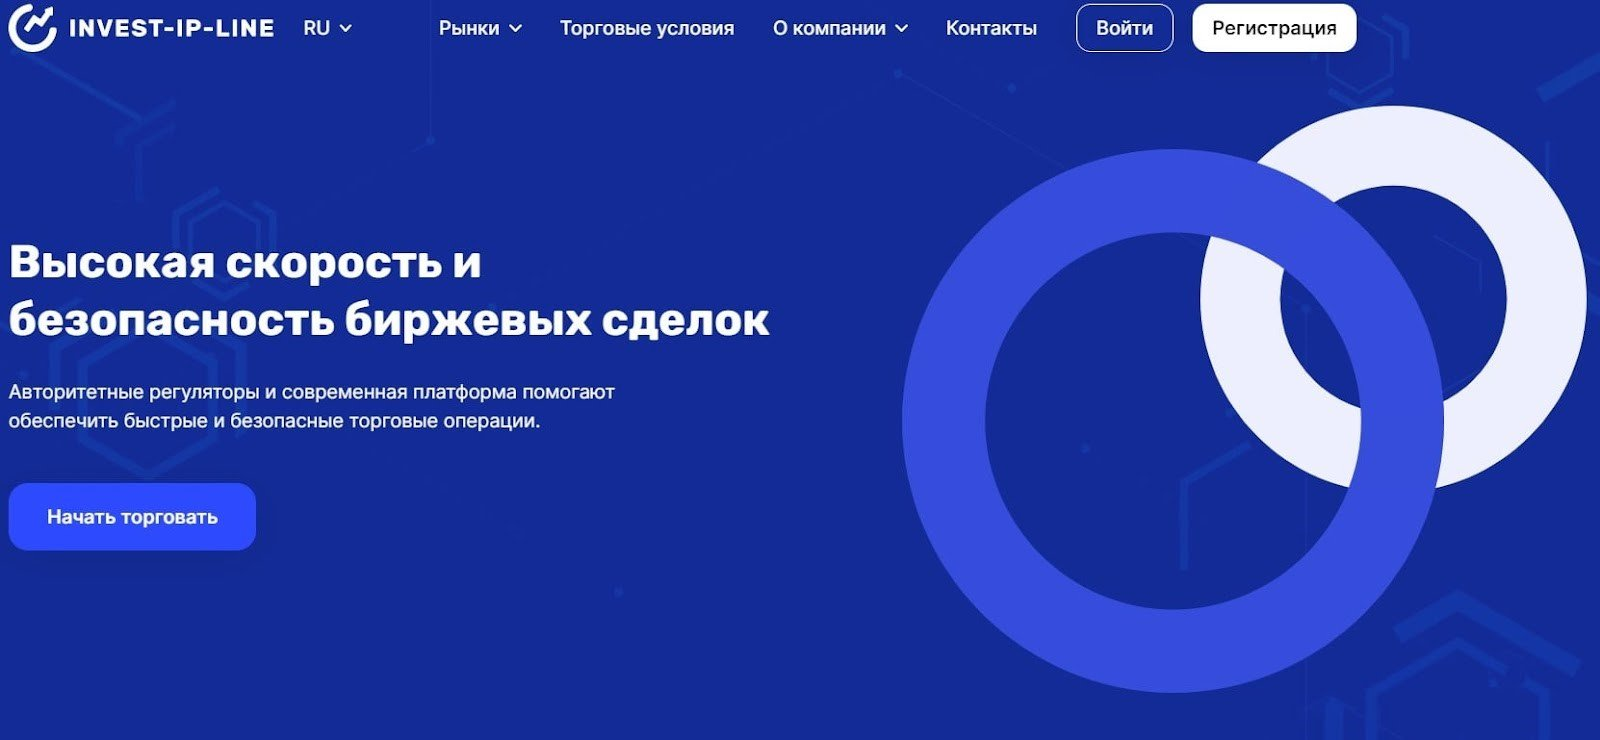 Invest-ip-line – проект активных аферистов